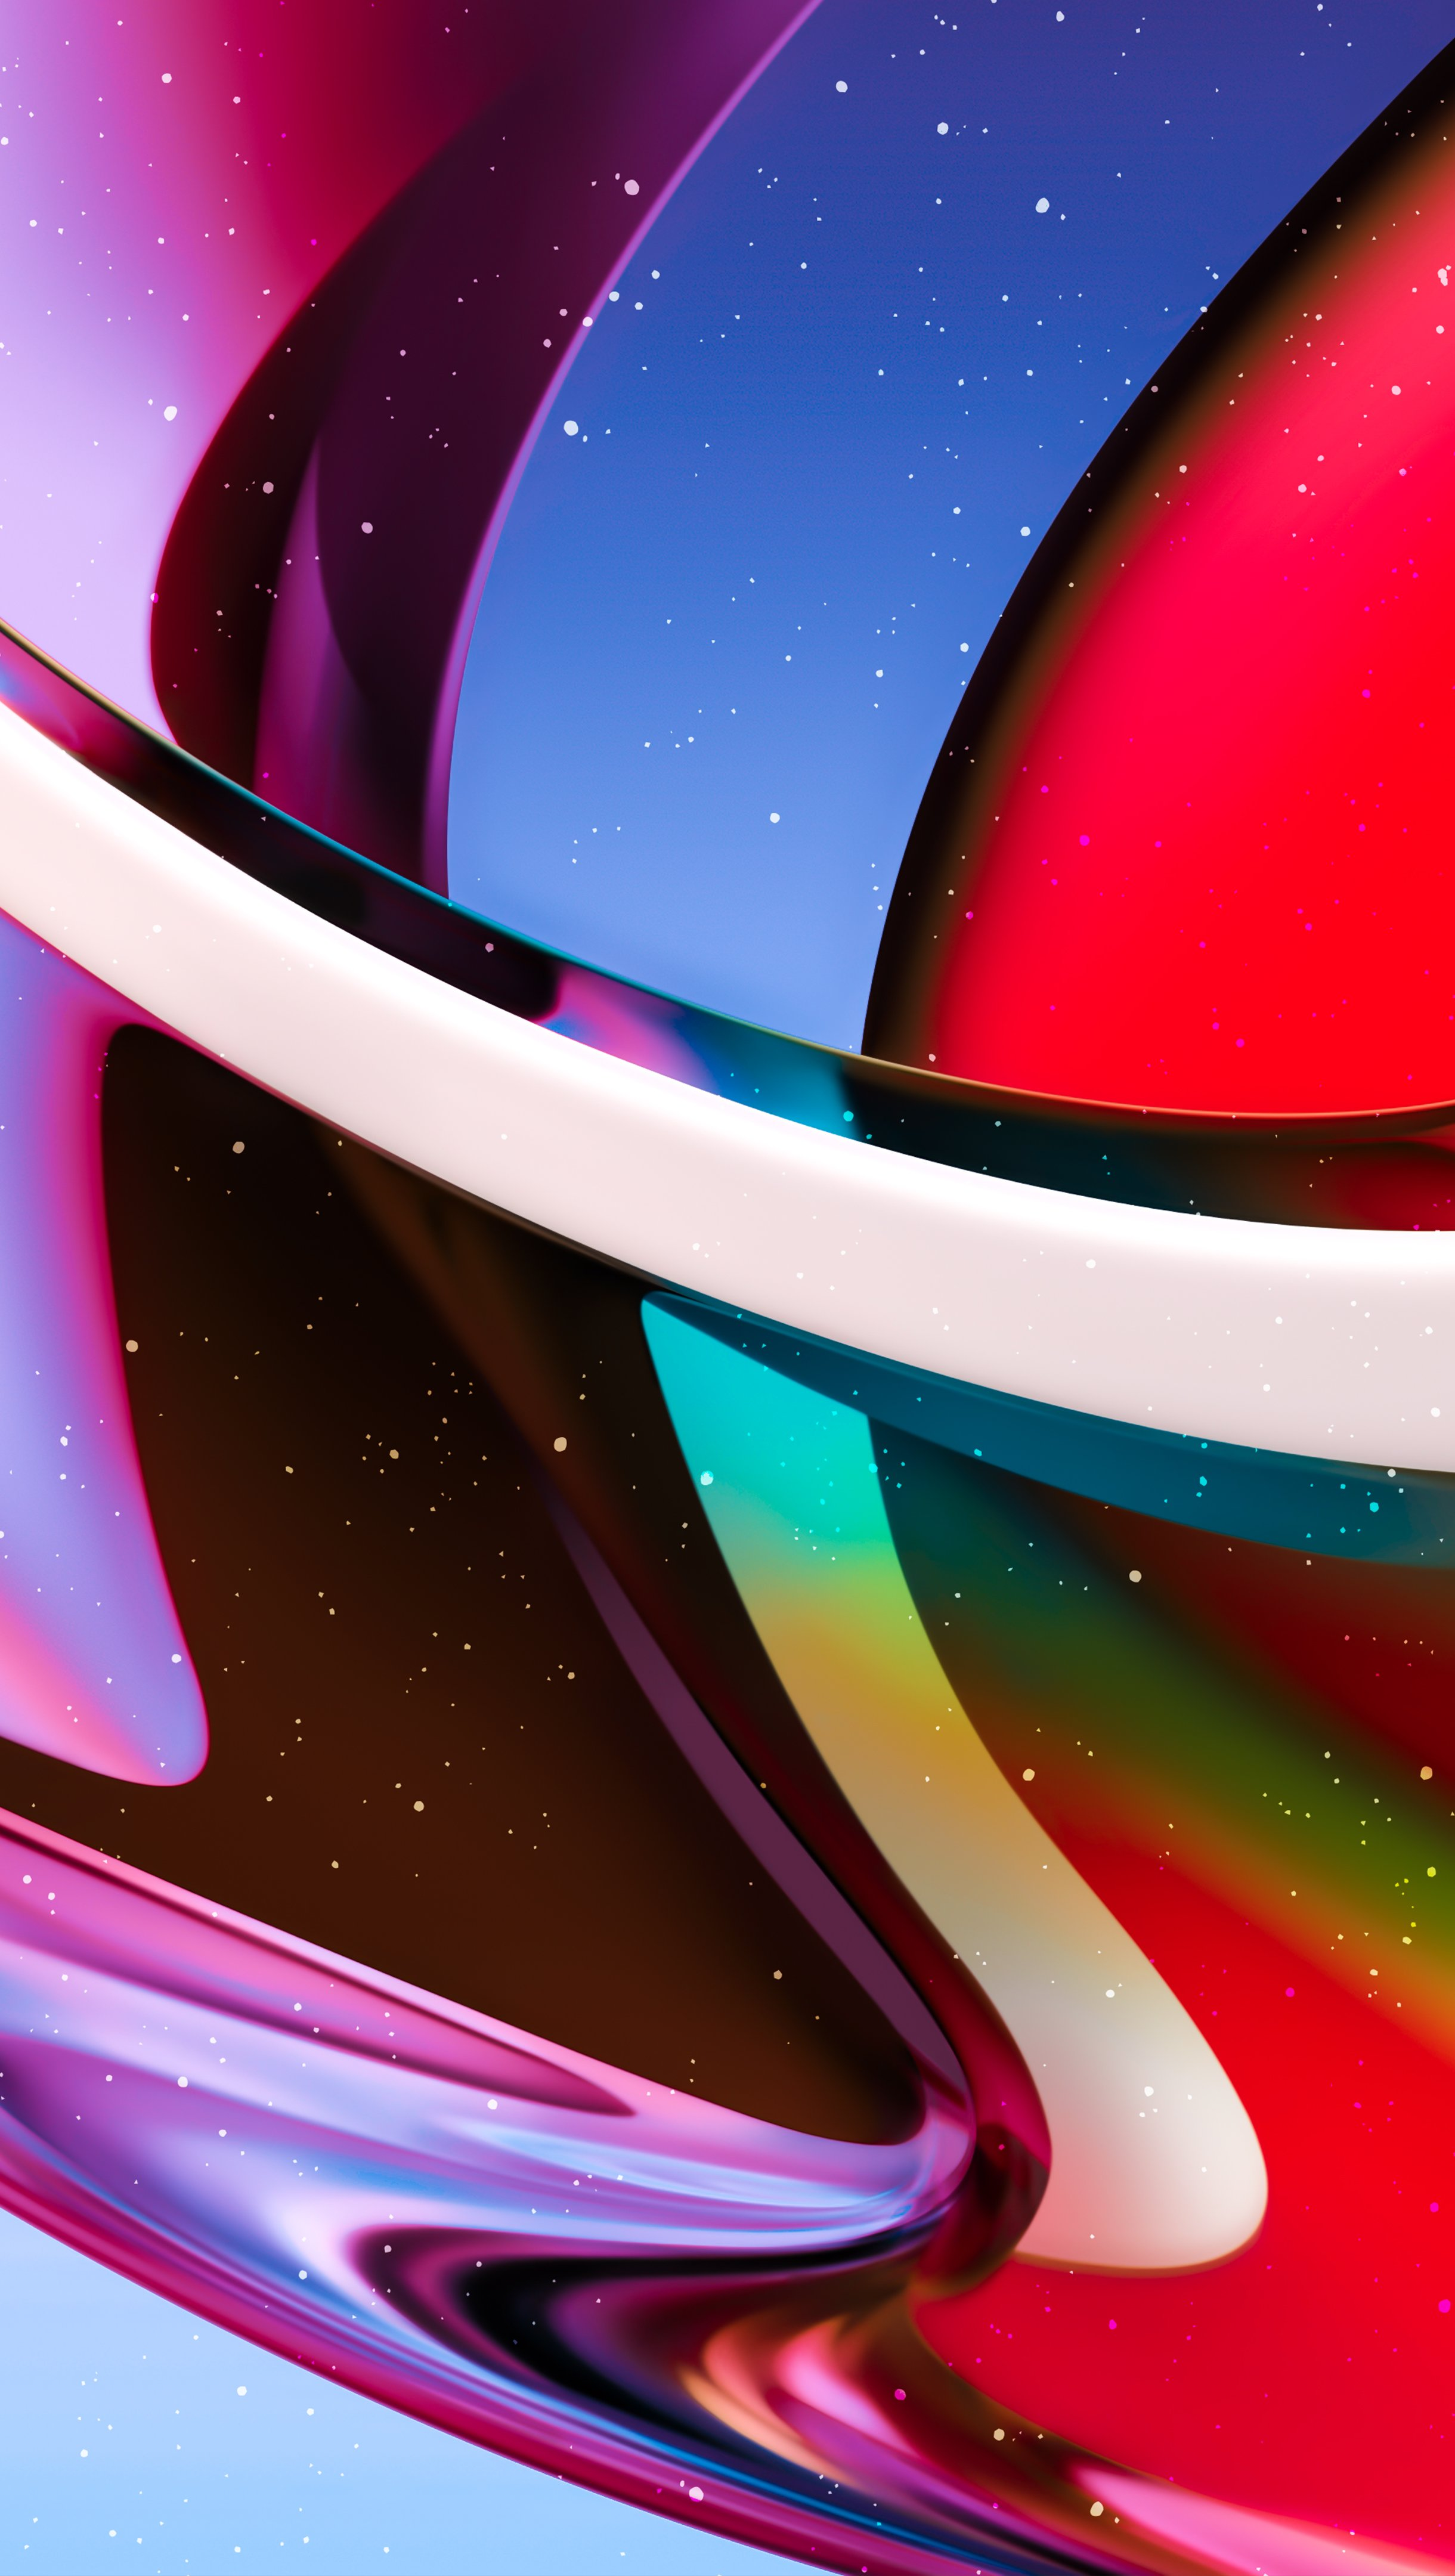 Fondos de pantalla Vidrio de colores Vertical